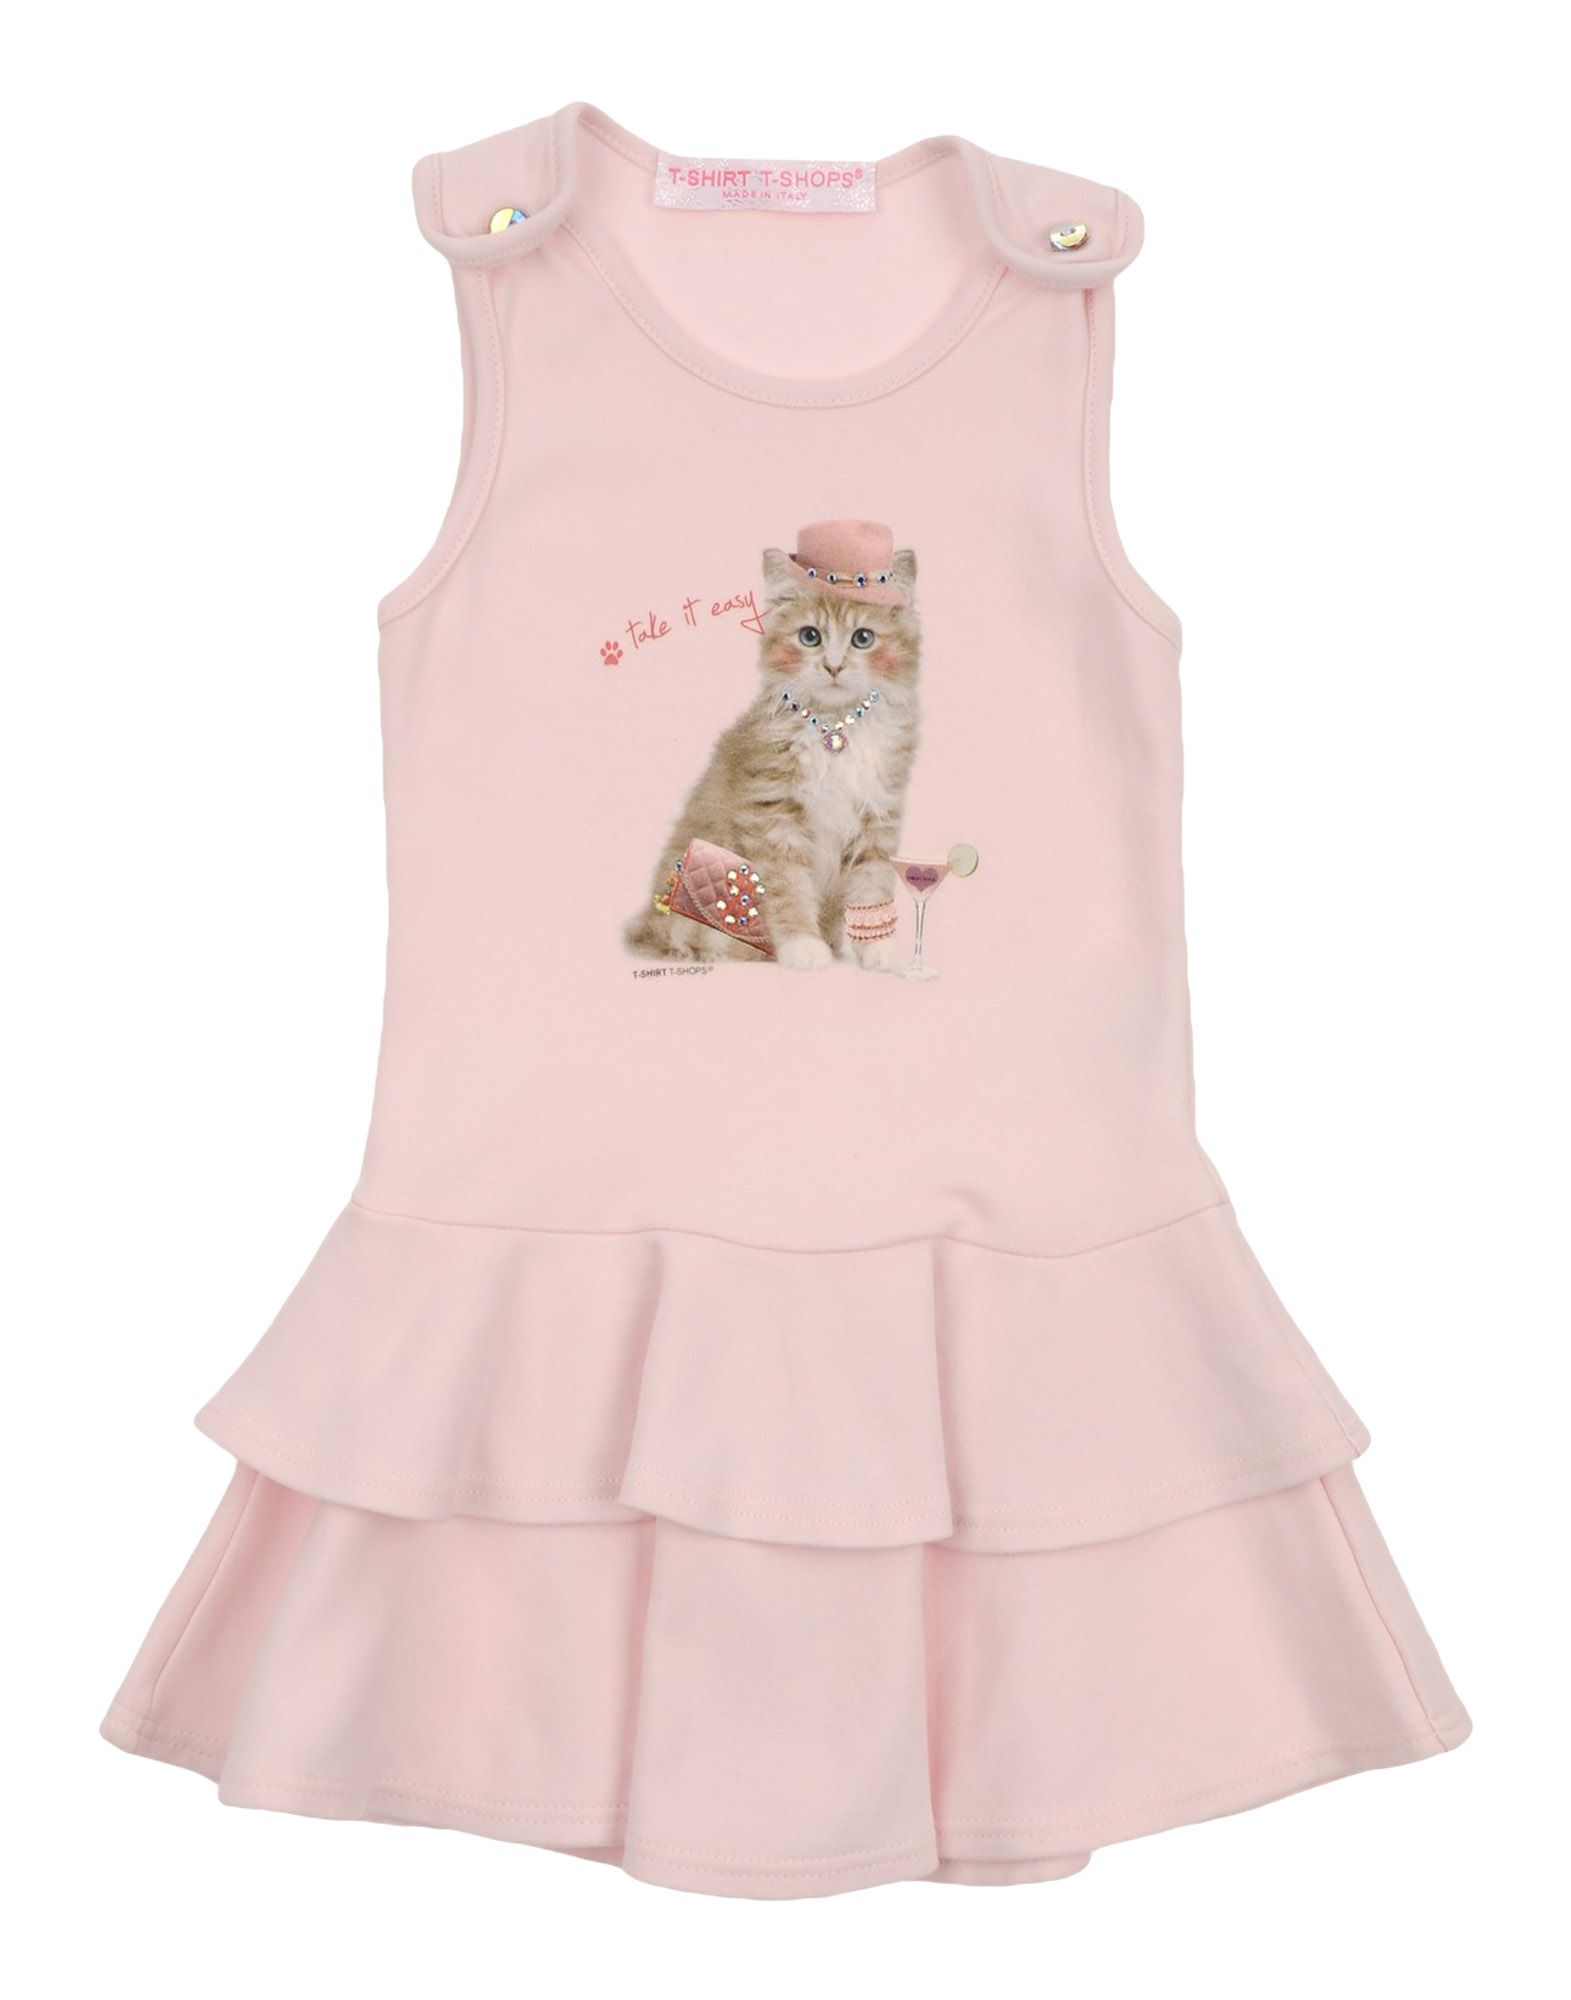 T-SHIRT T-SHOPS Mädchen 0-24 monate Kleid Farbe Hellrosa Größe 4